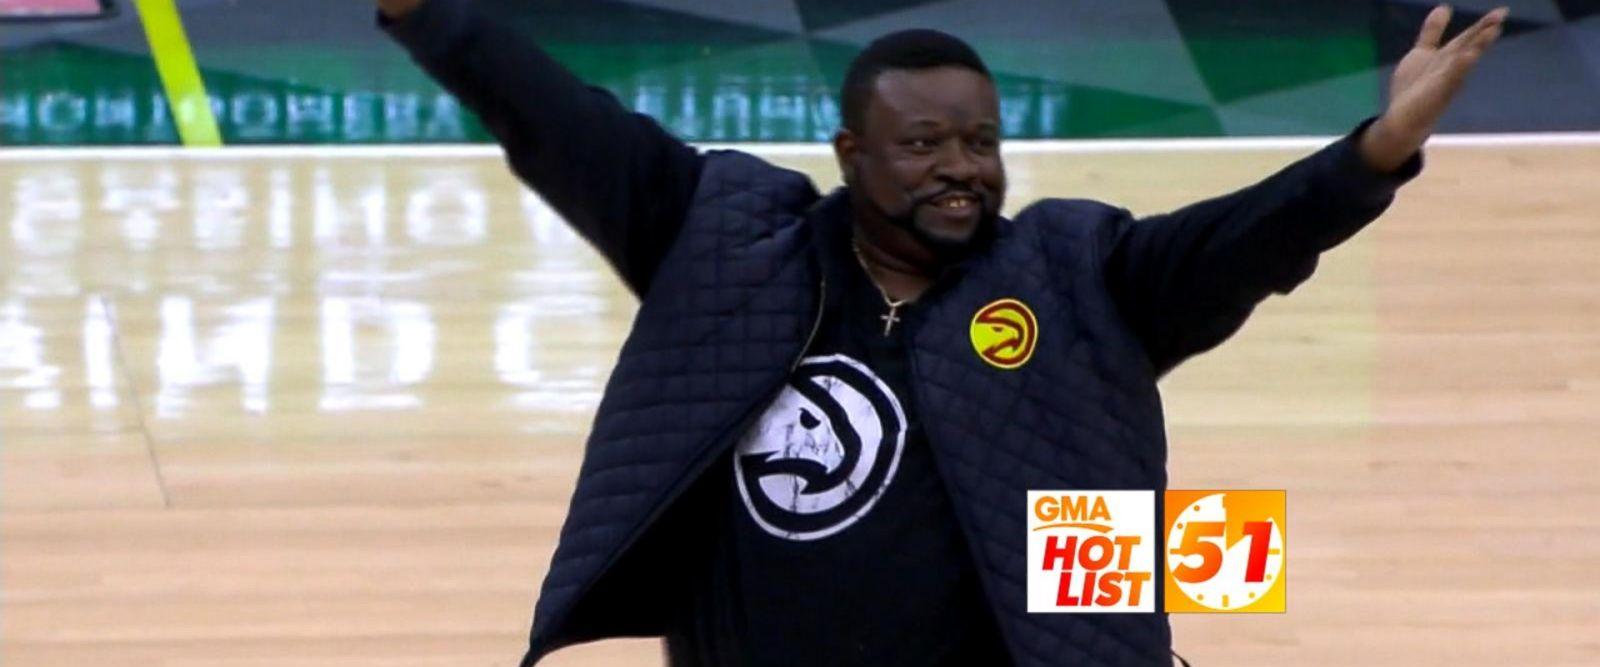 VIDEO: 'GMA' Hot List: Fan has best reaction to sinking half-court shot